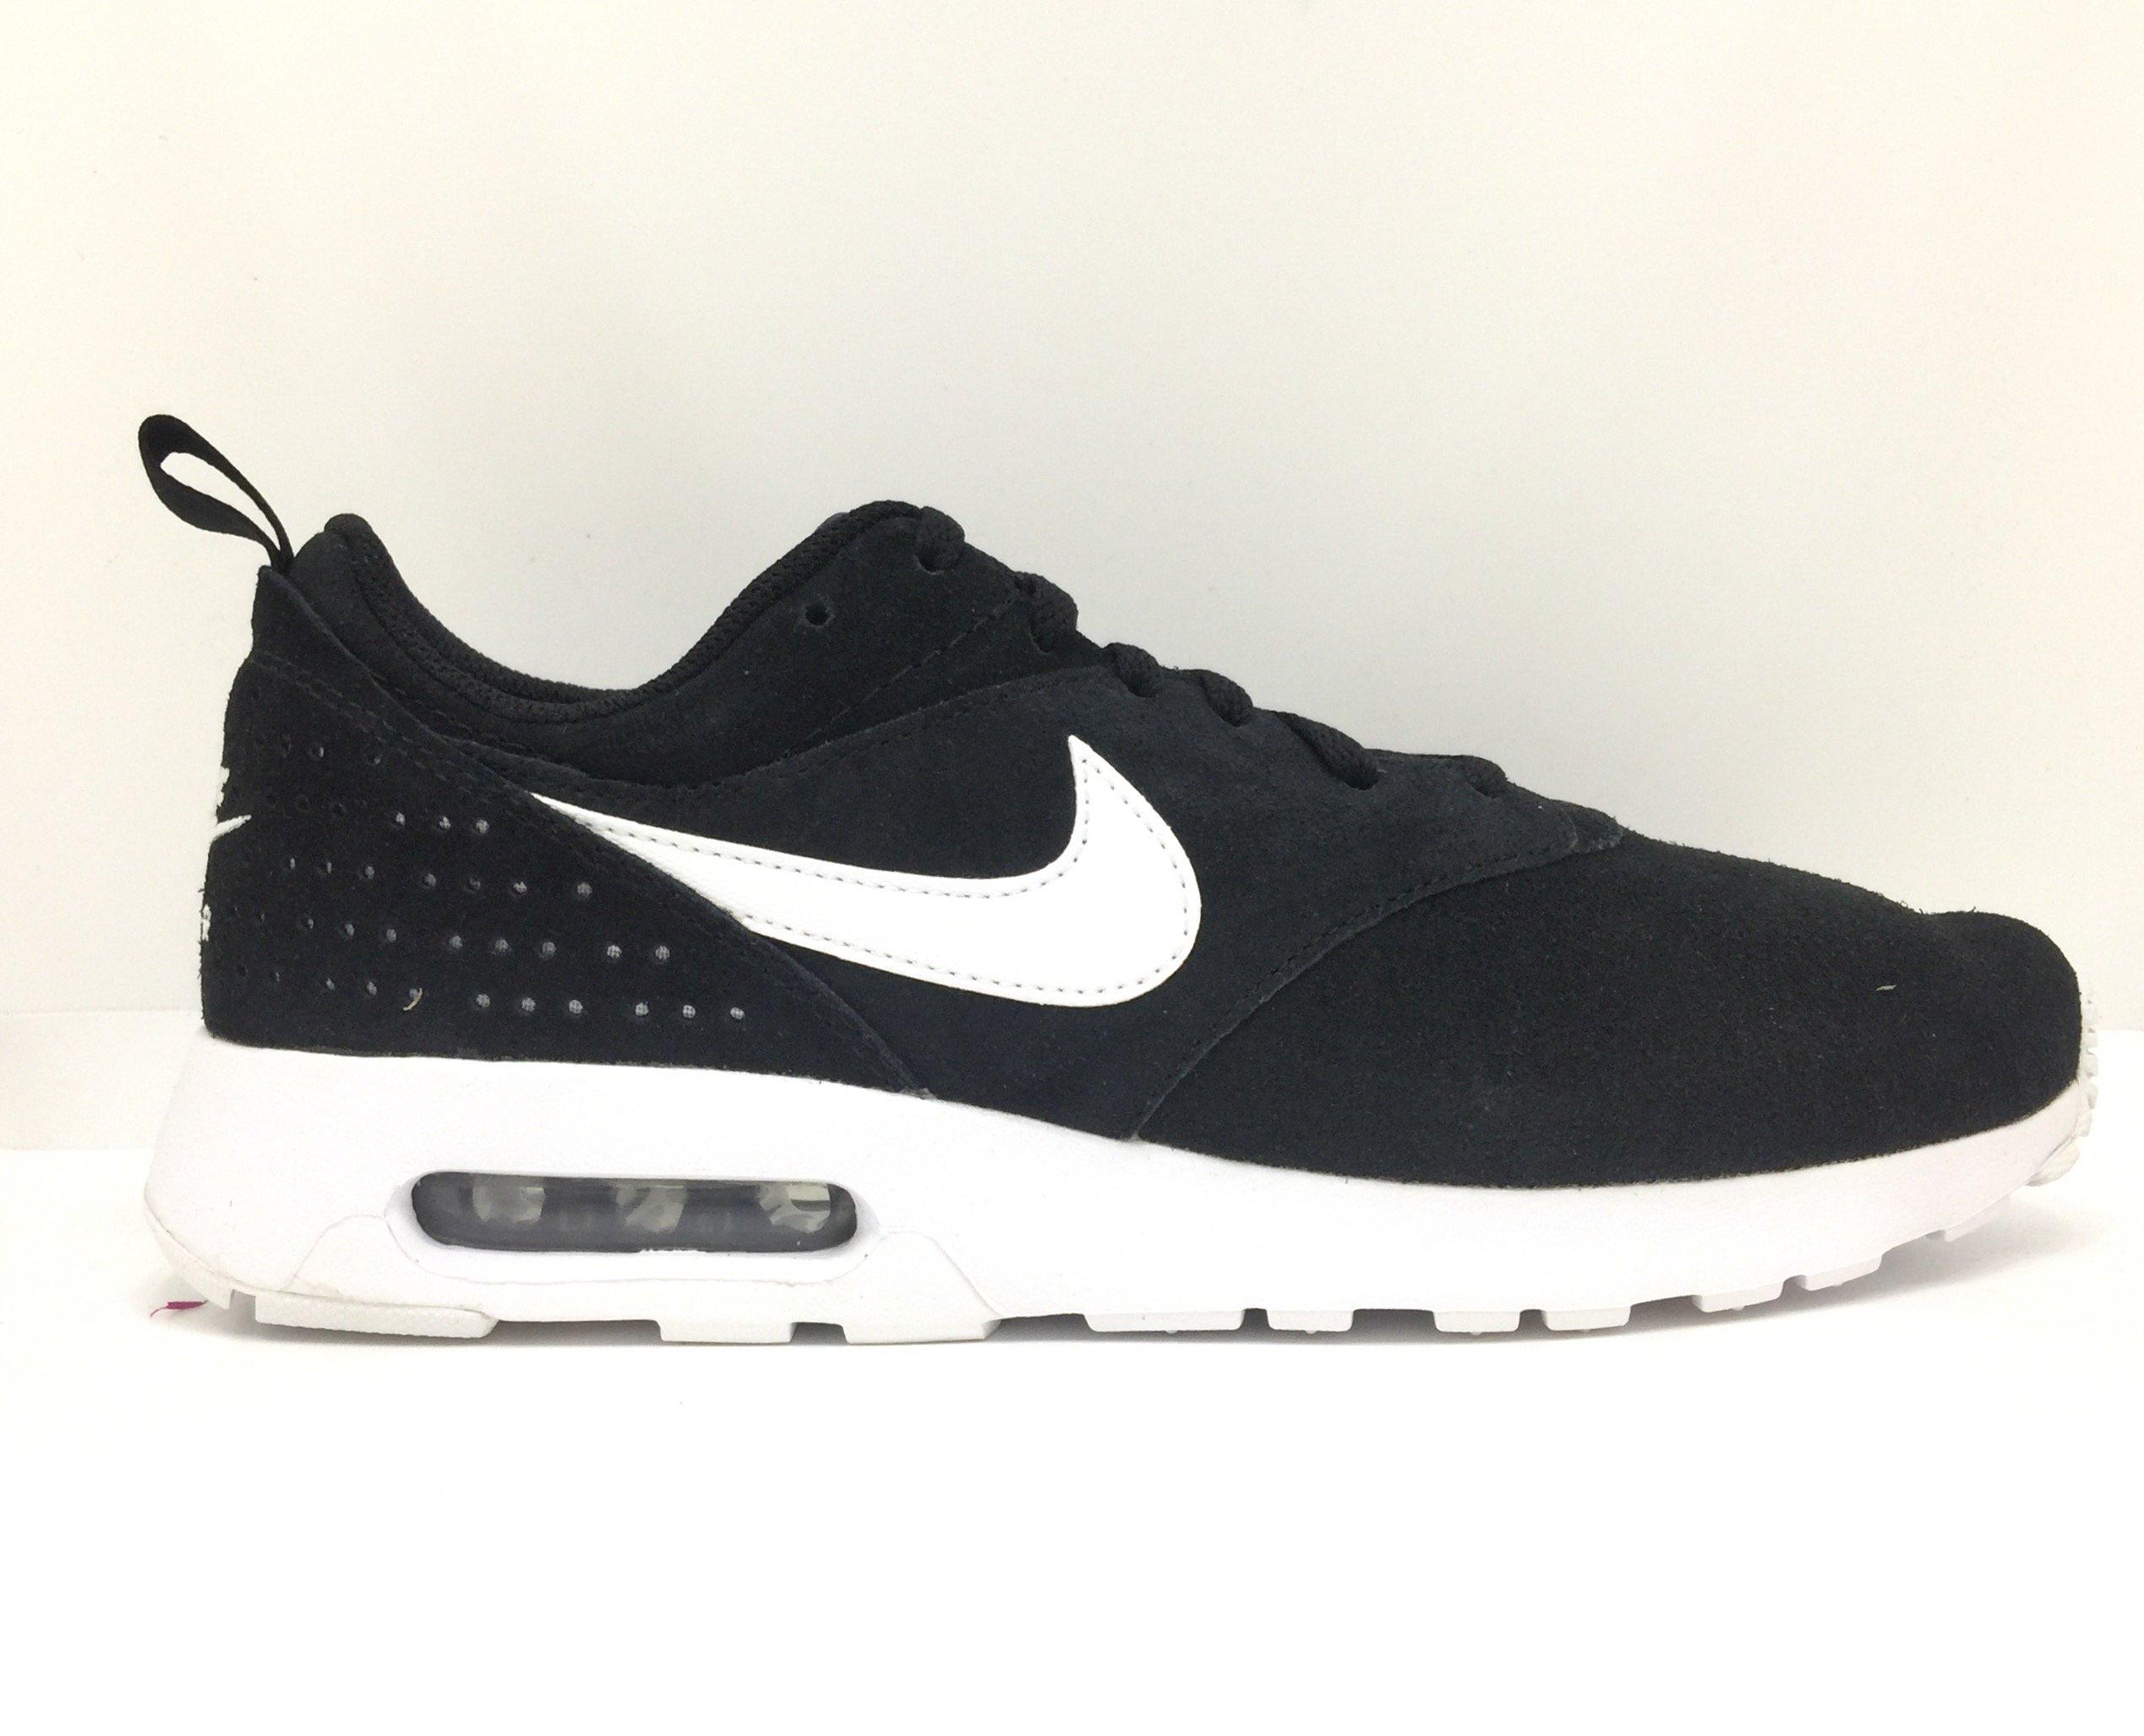 Nike Air Max Tavas LTR Sneaker Uomo 802611 001 Scarpe da ginnastica shoessneakers SVENDITA